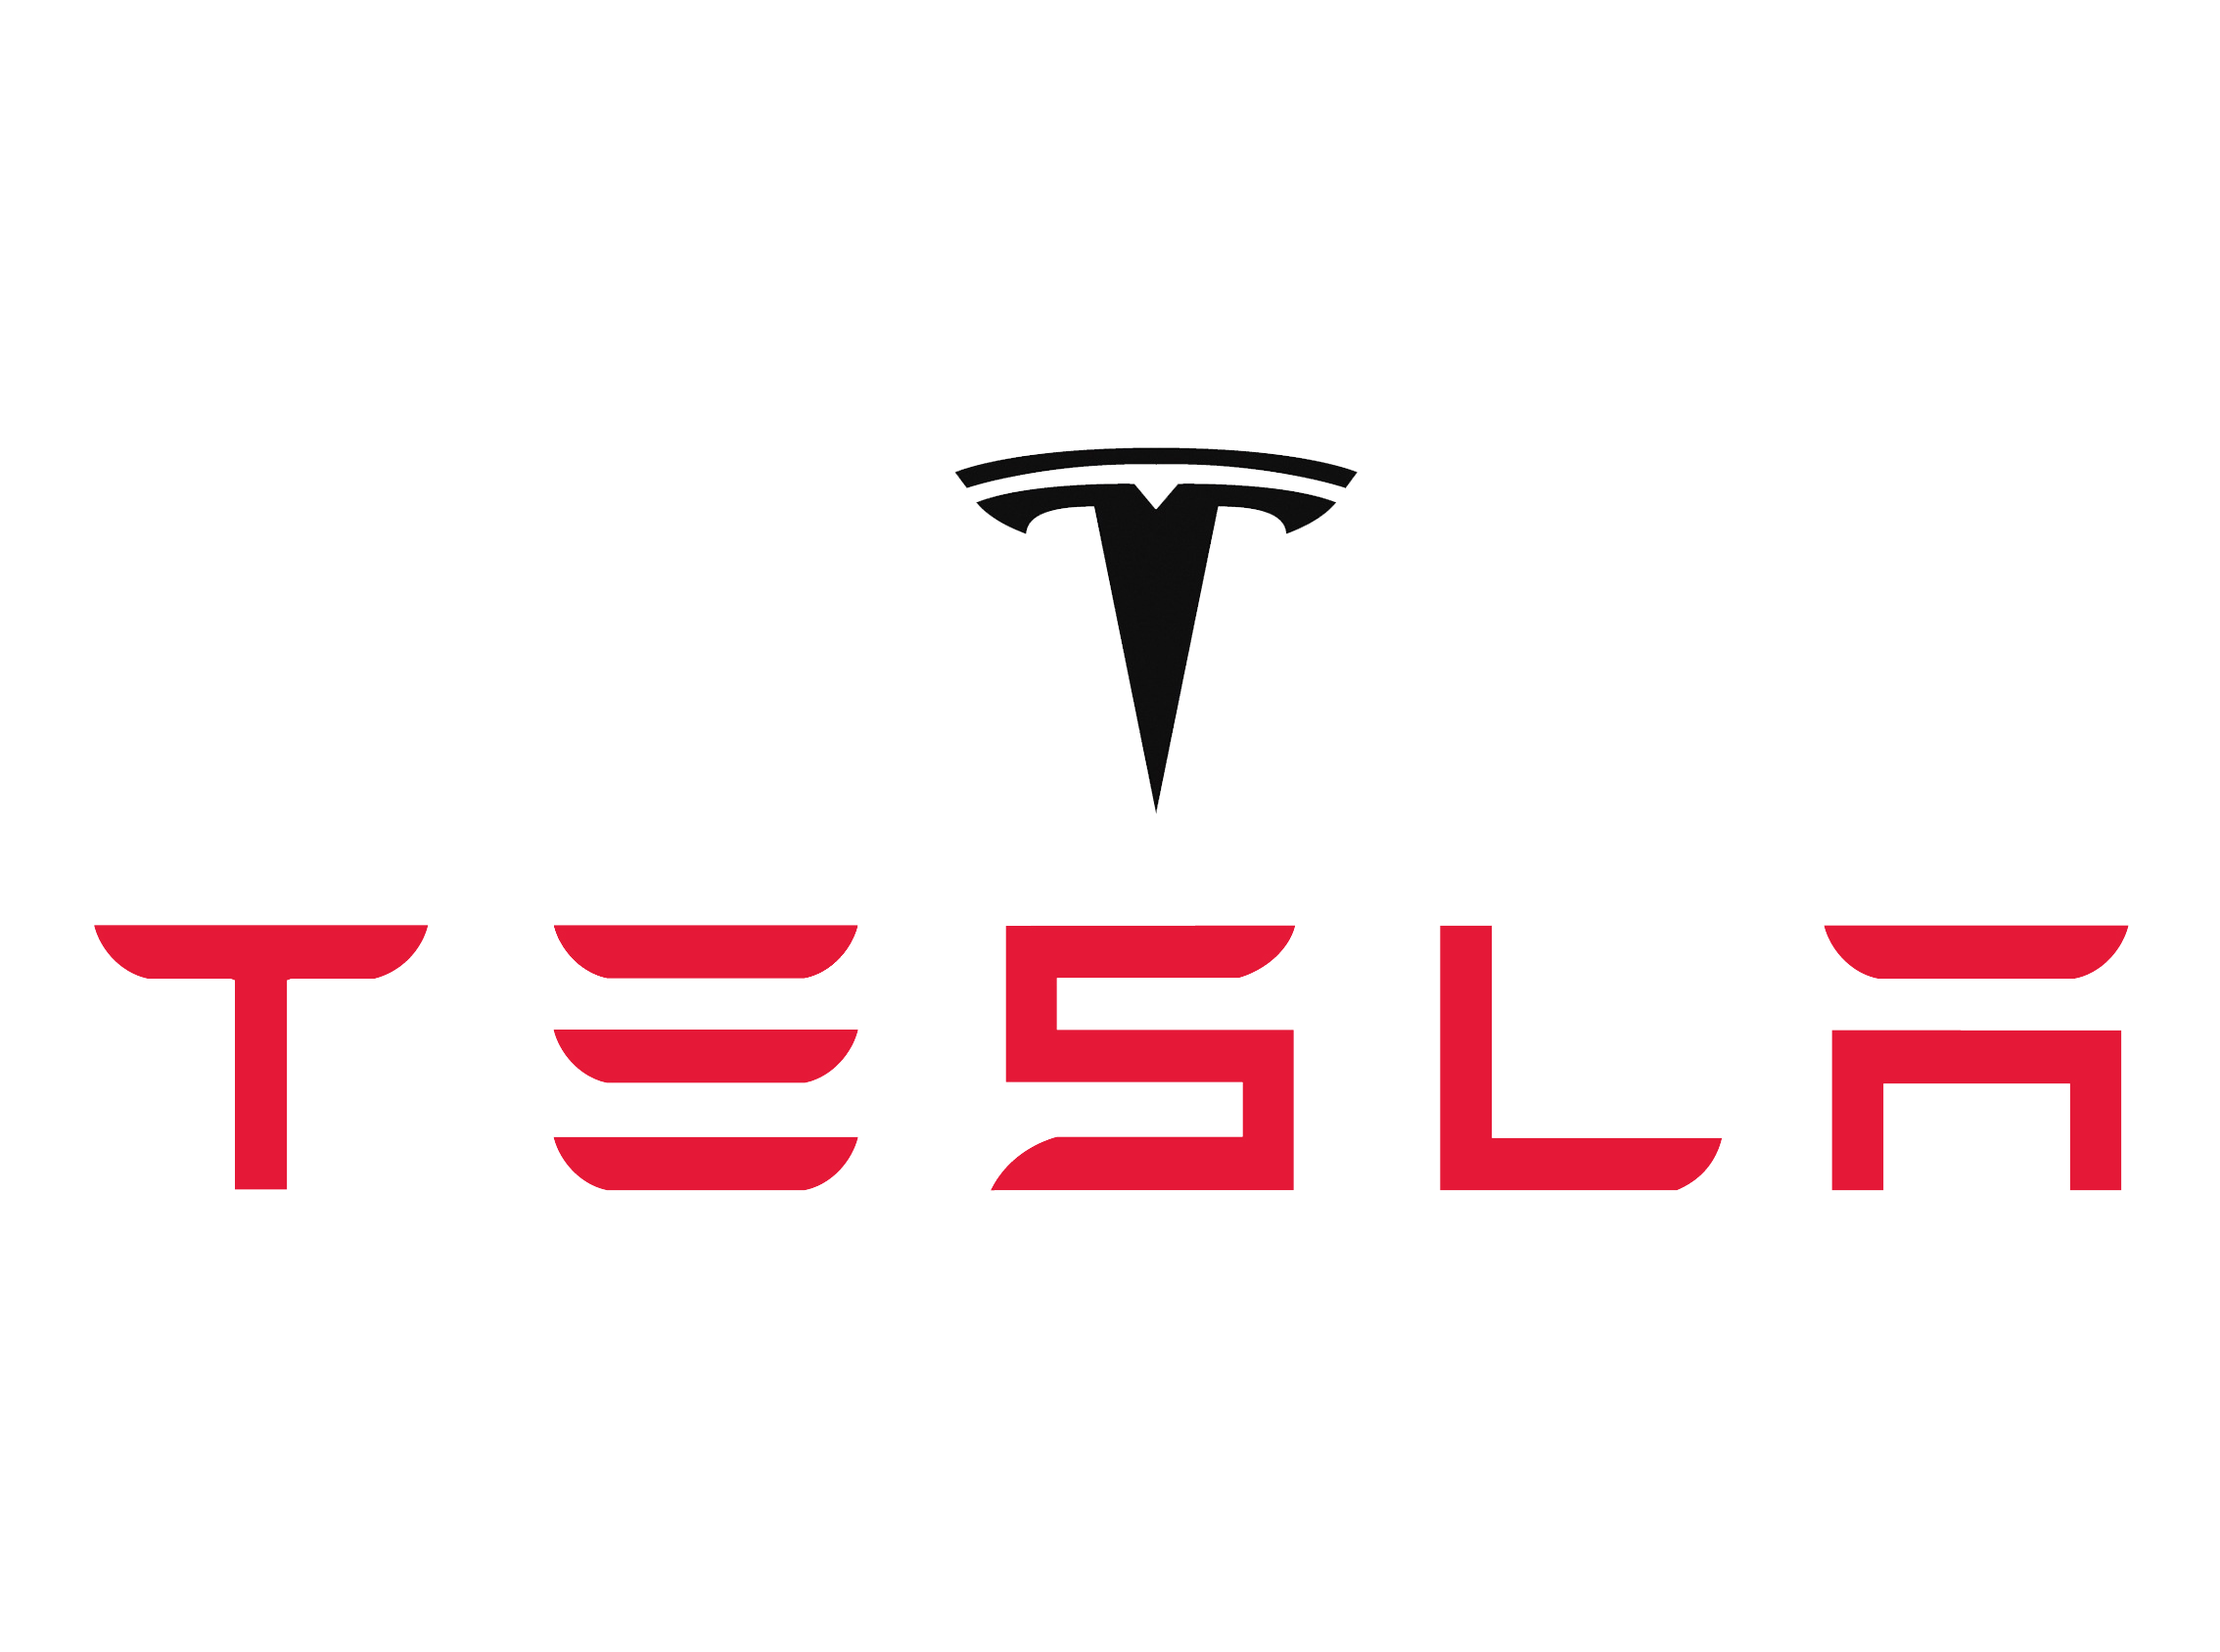 Invertir en Tesla